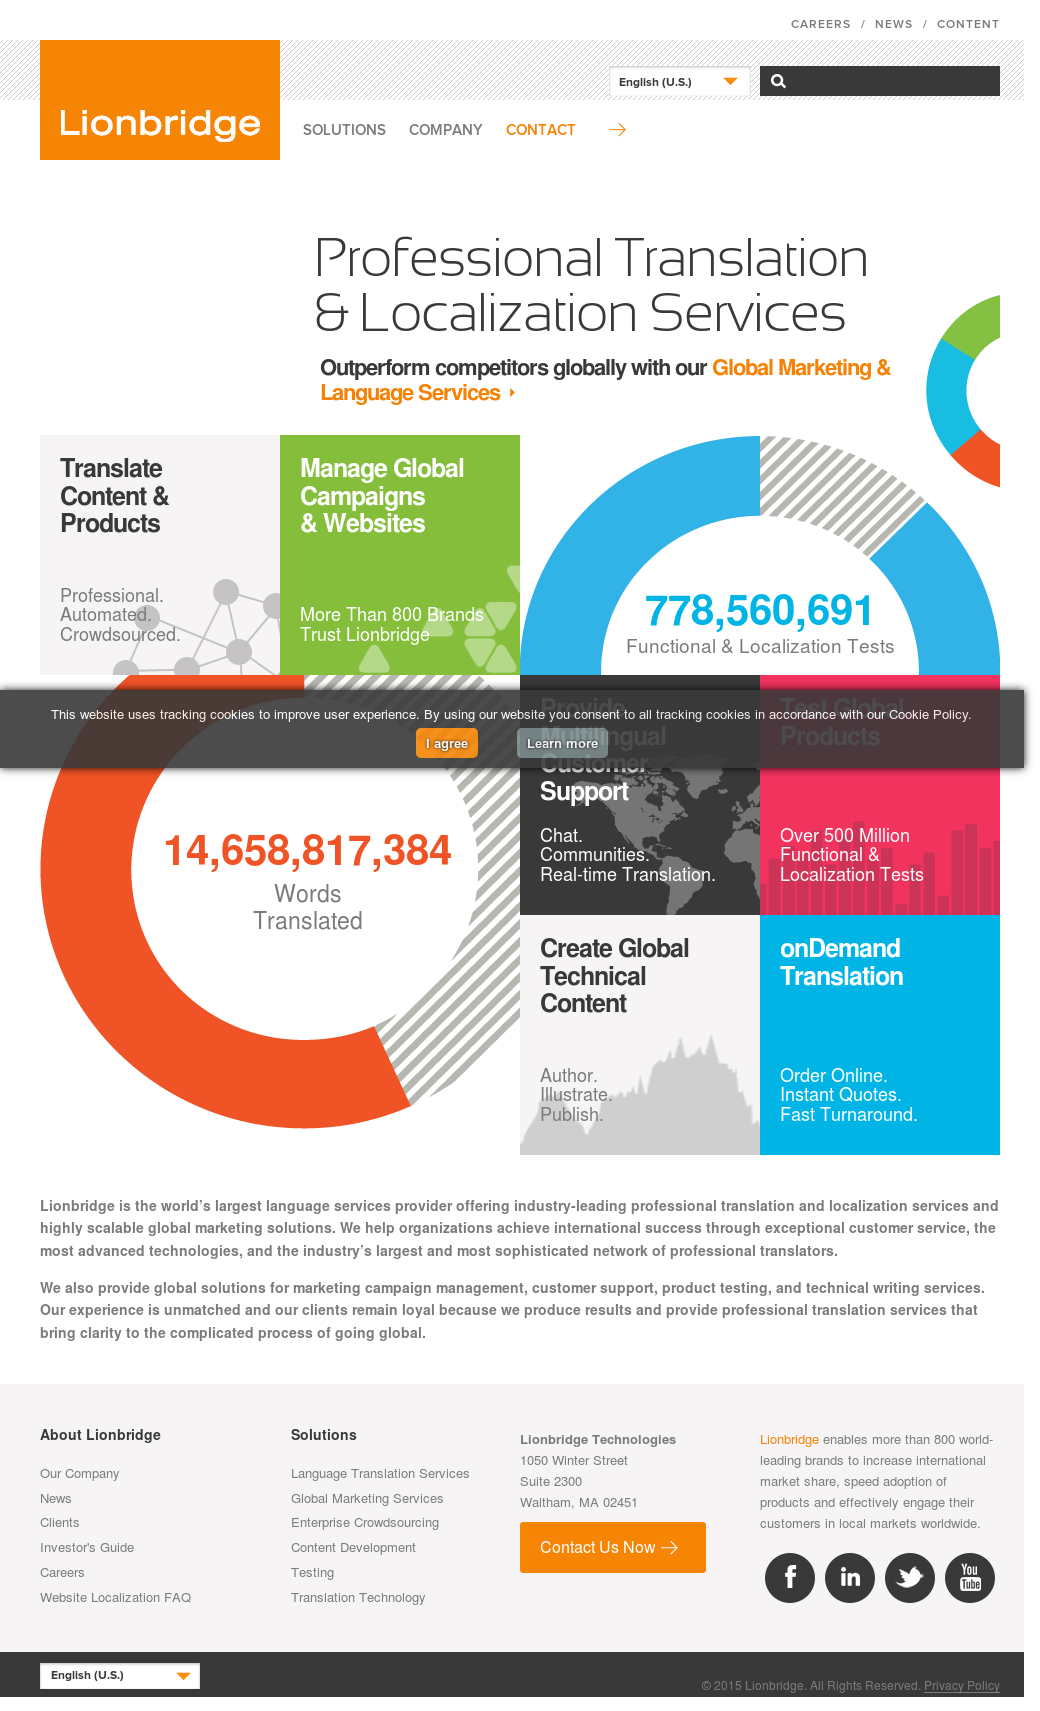 Lionbridge Competitors, Revenue and Employees - Owler Company Profile